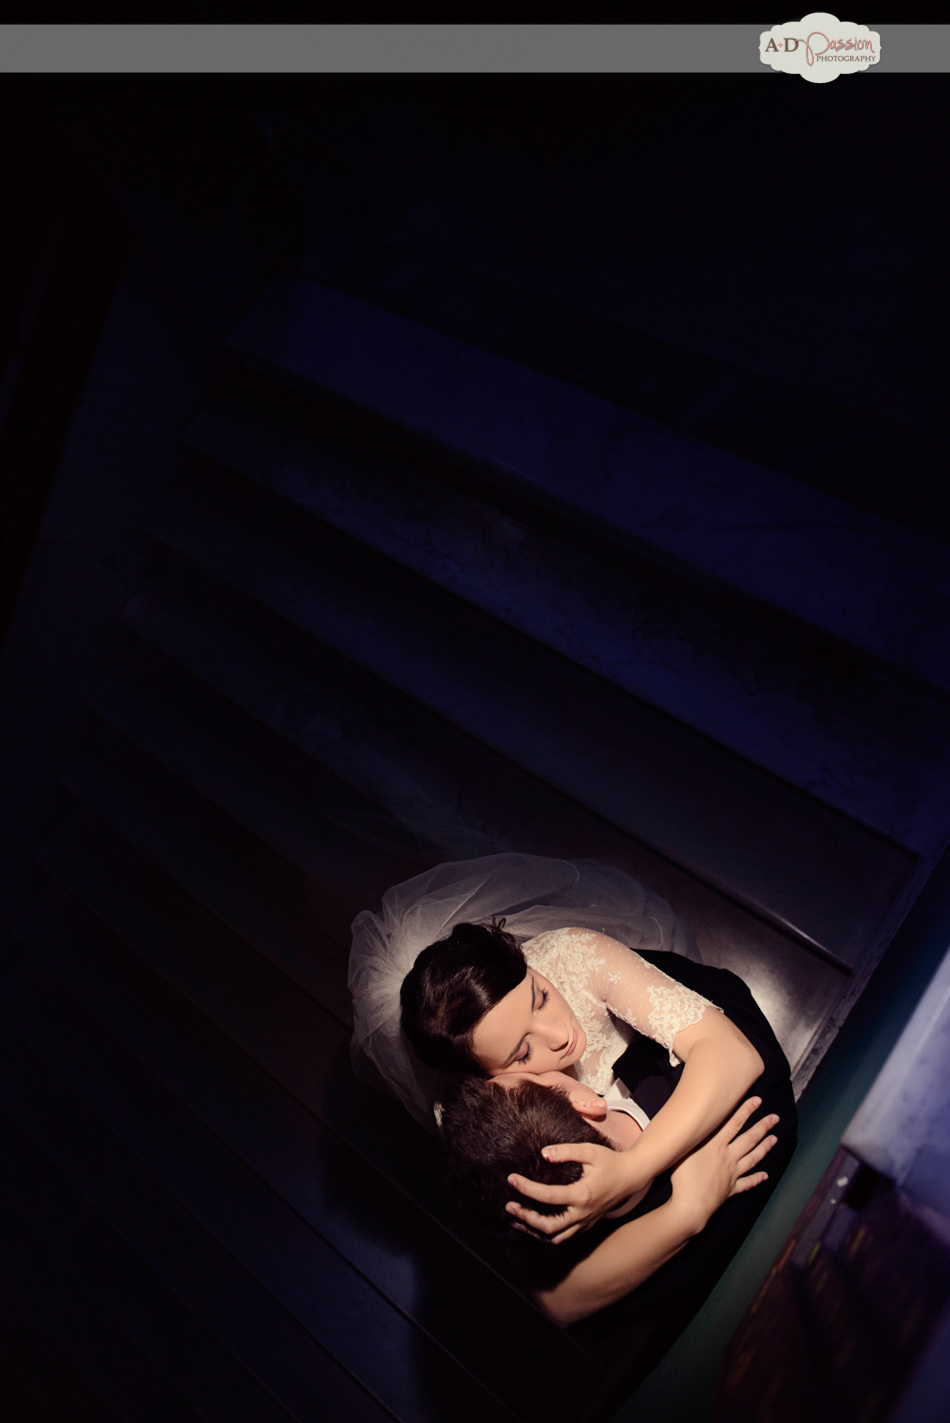 AD Passion Photography | fotograf-nunta_flavian-si-alina_nunta-targu-mures_0072 | Adelin, Dida, fotograf profesionist, fotograf de nunta, fotografie de nunta, fotograf Timisoara, fotograf Craiova, fotograf Bucuresti, fotograf Arad, nunta Timisoara, nunta Arad, nunta Bucuresti, nunta Craiova